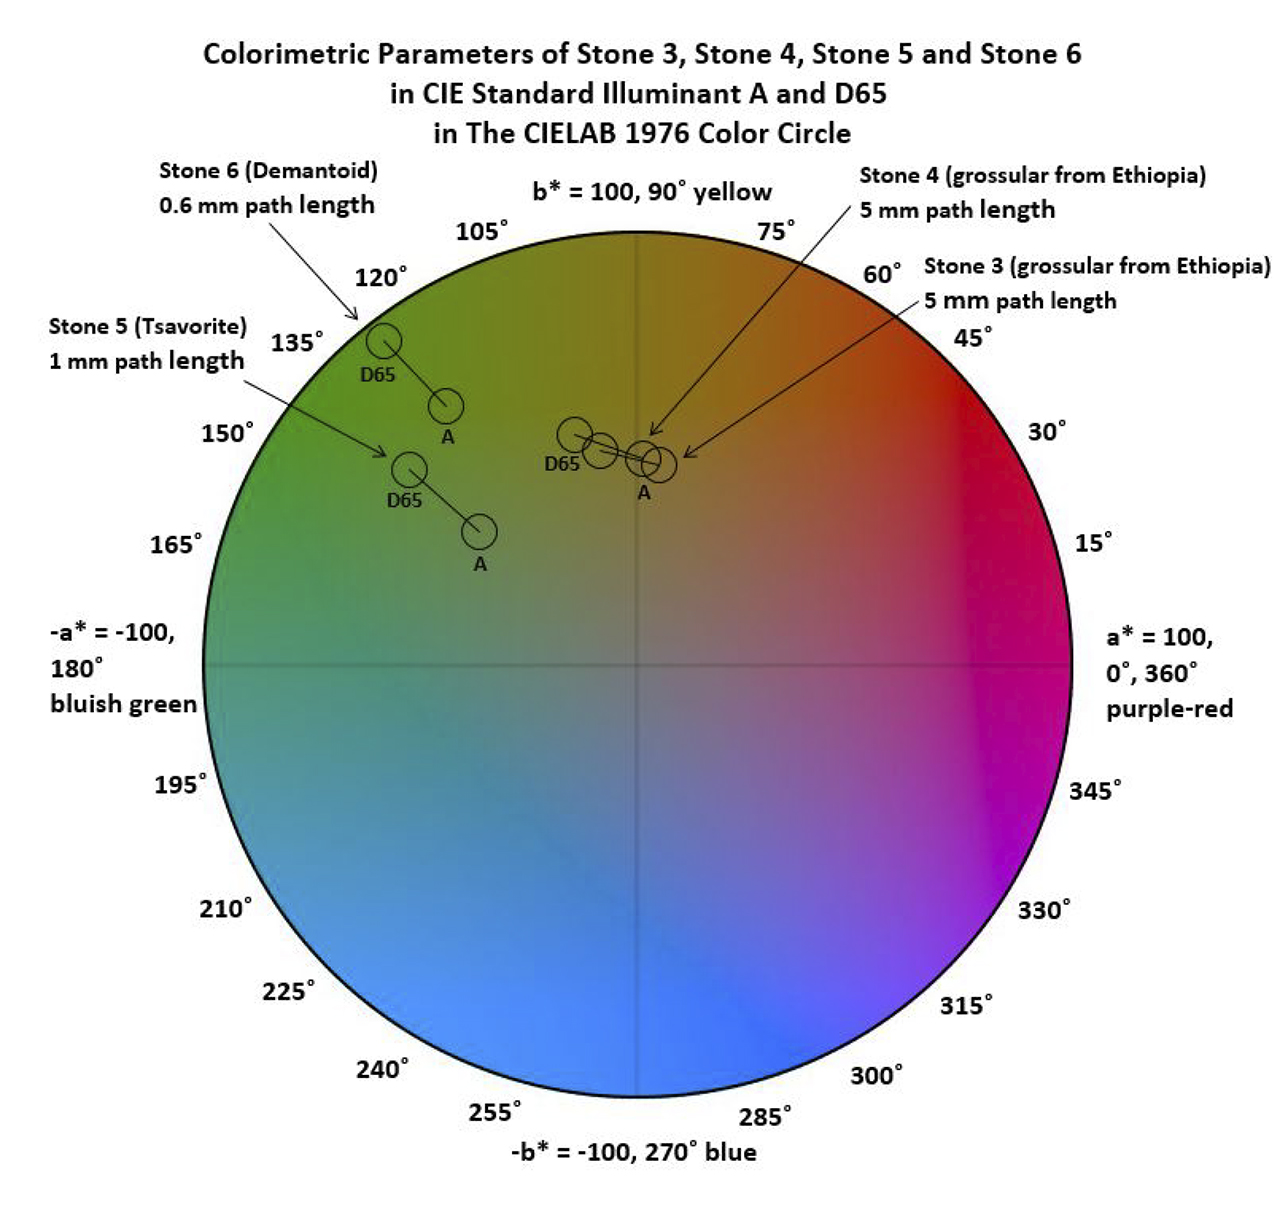 Plot of color coordinates in CIE 1976 color circle.